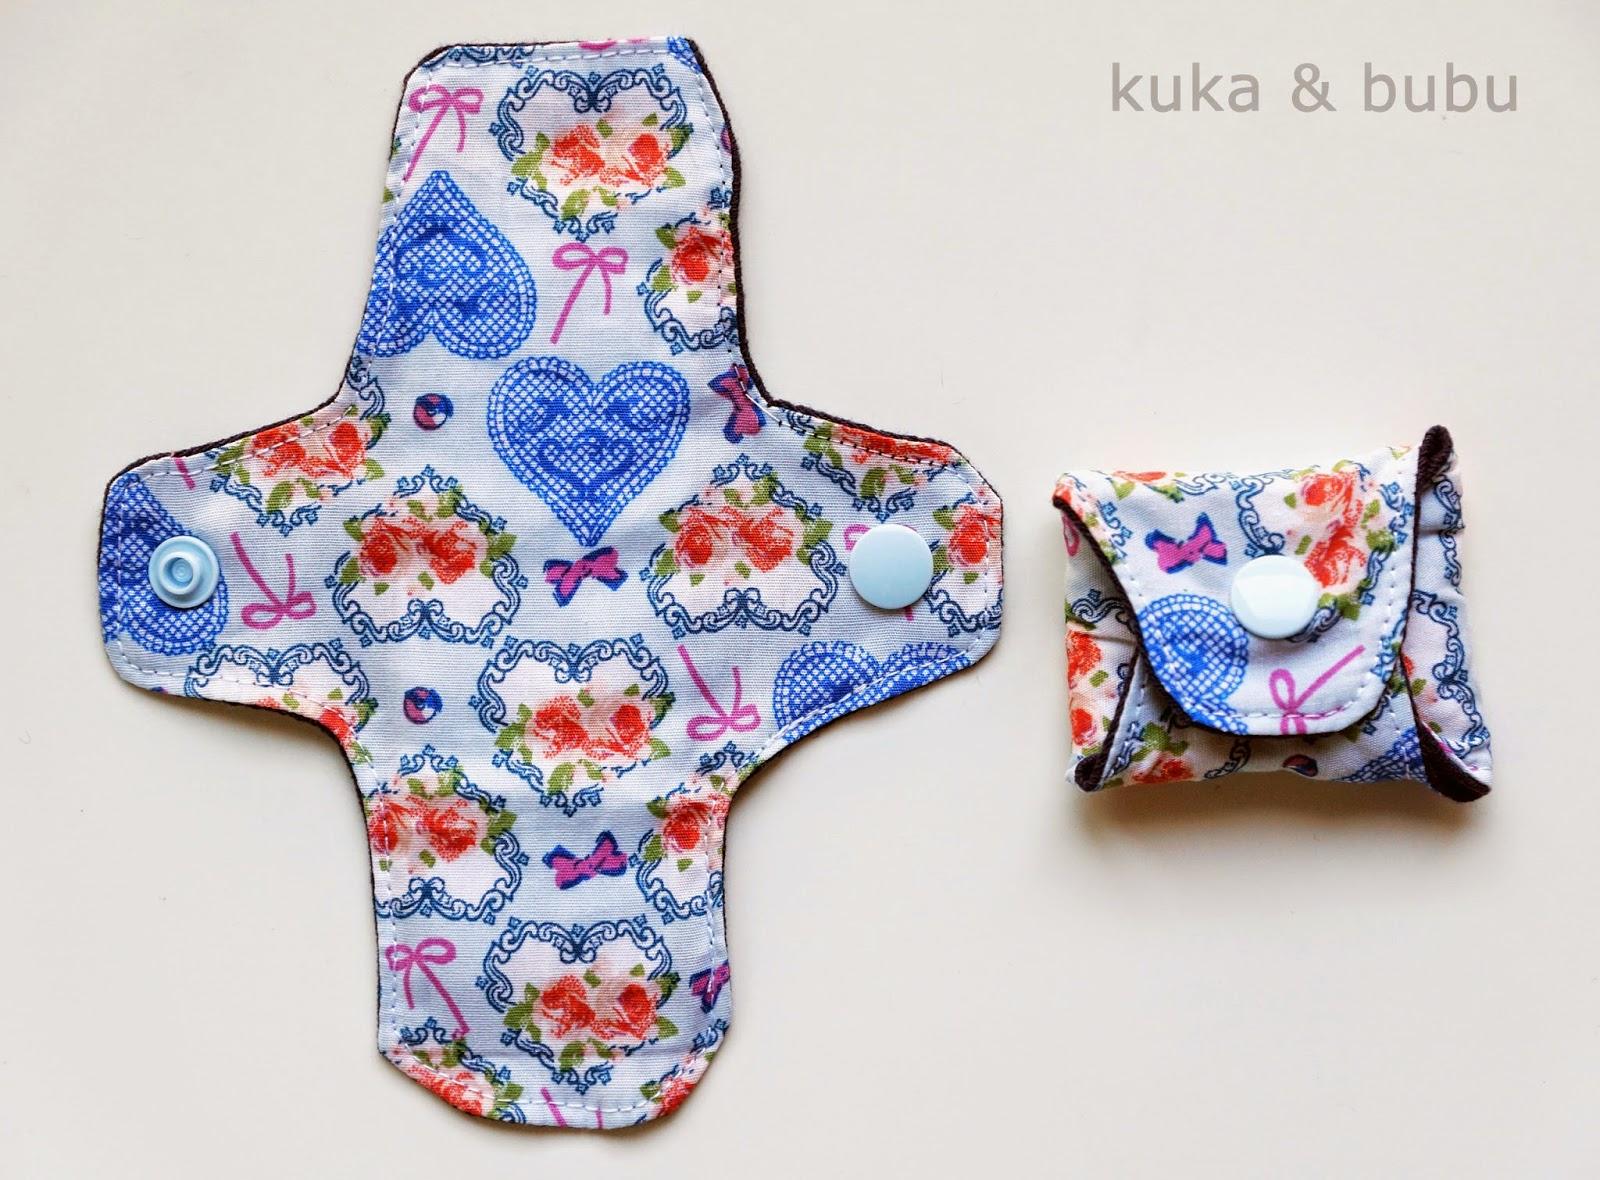 http://kukaandbubu.blogspot.com.es/2015/03/semana-intima-by-kiwa-kawaii-salvaslips.html